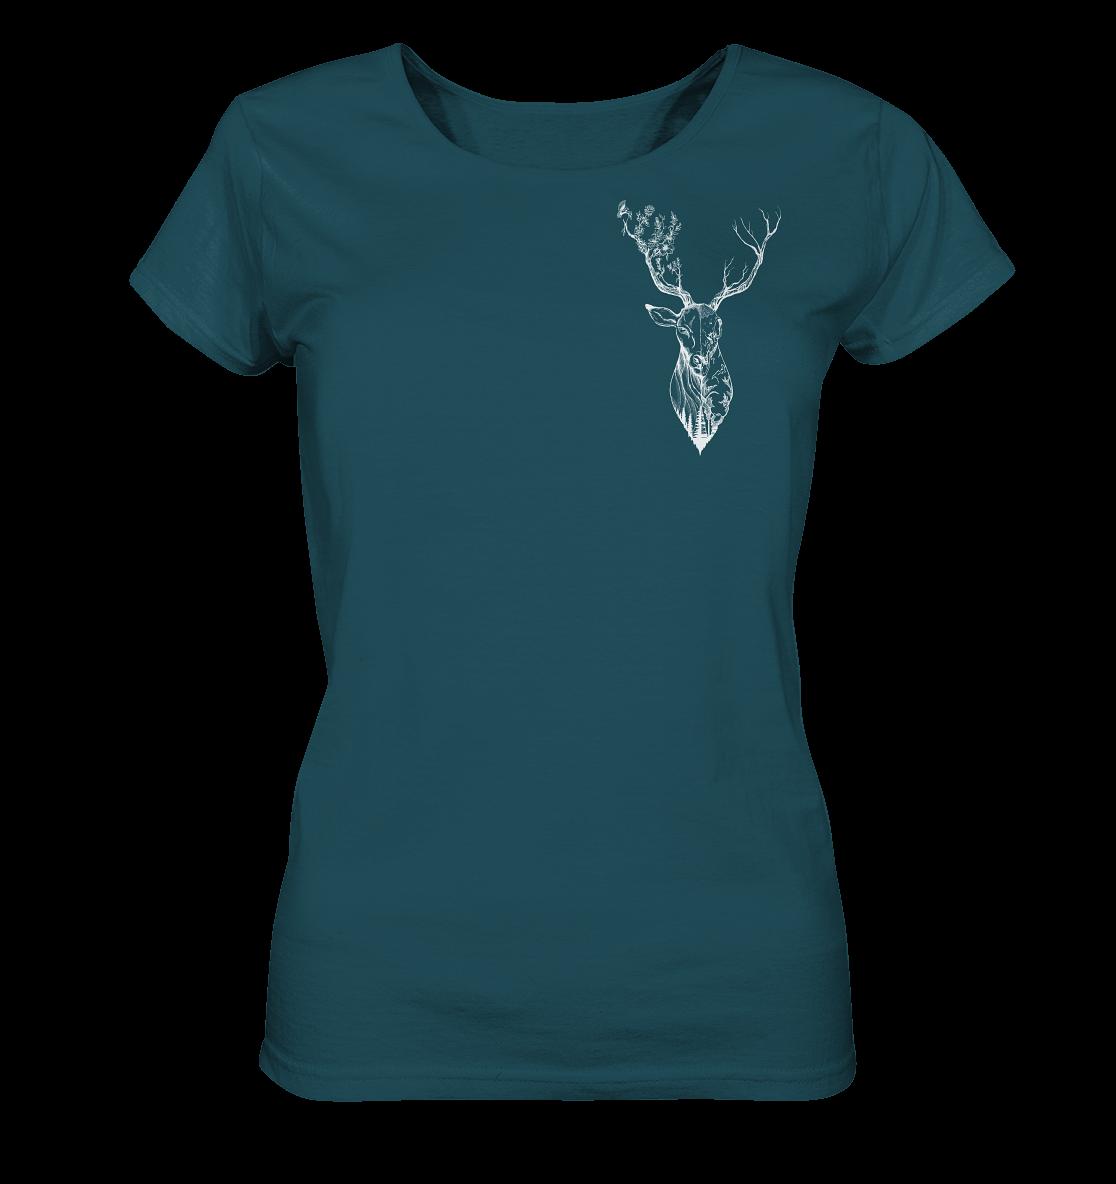 front-ladies-organic-shirt-204d59-1116x-6.png